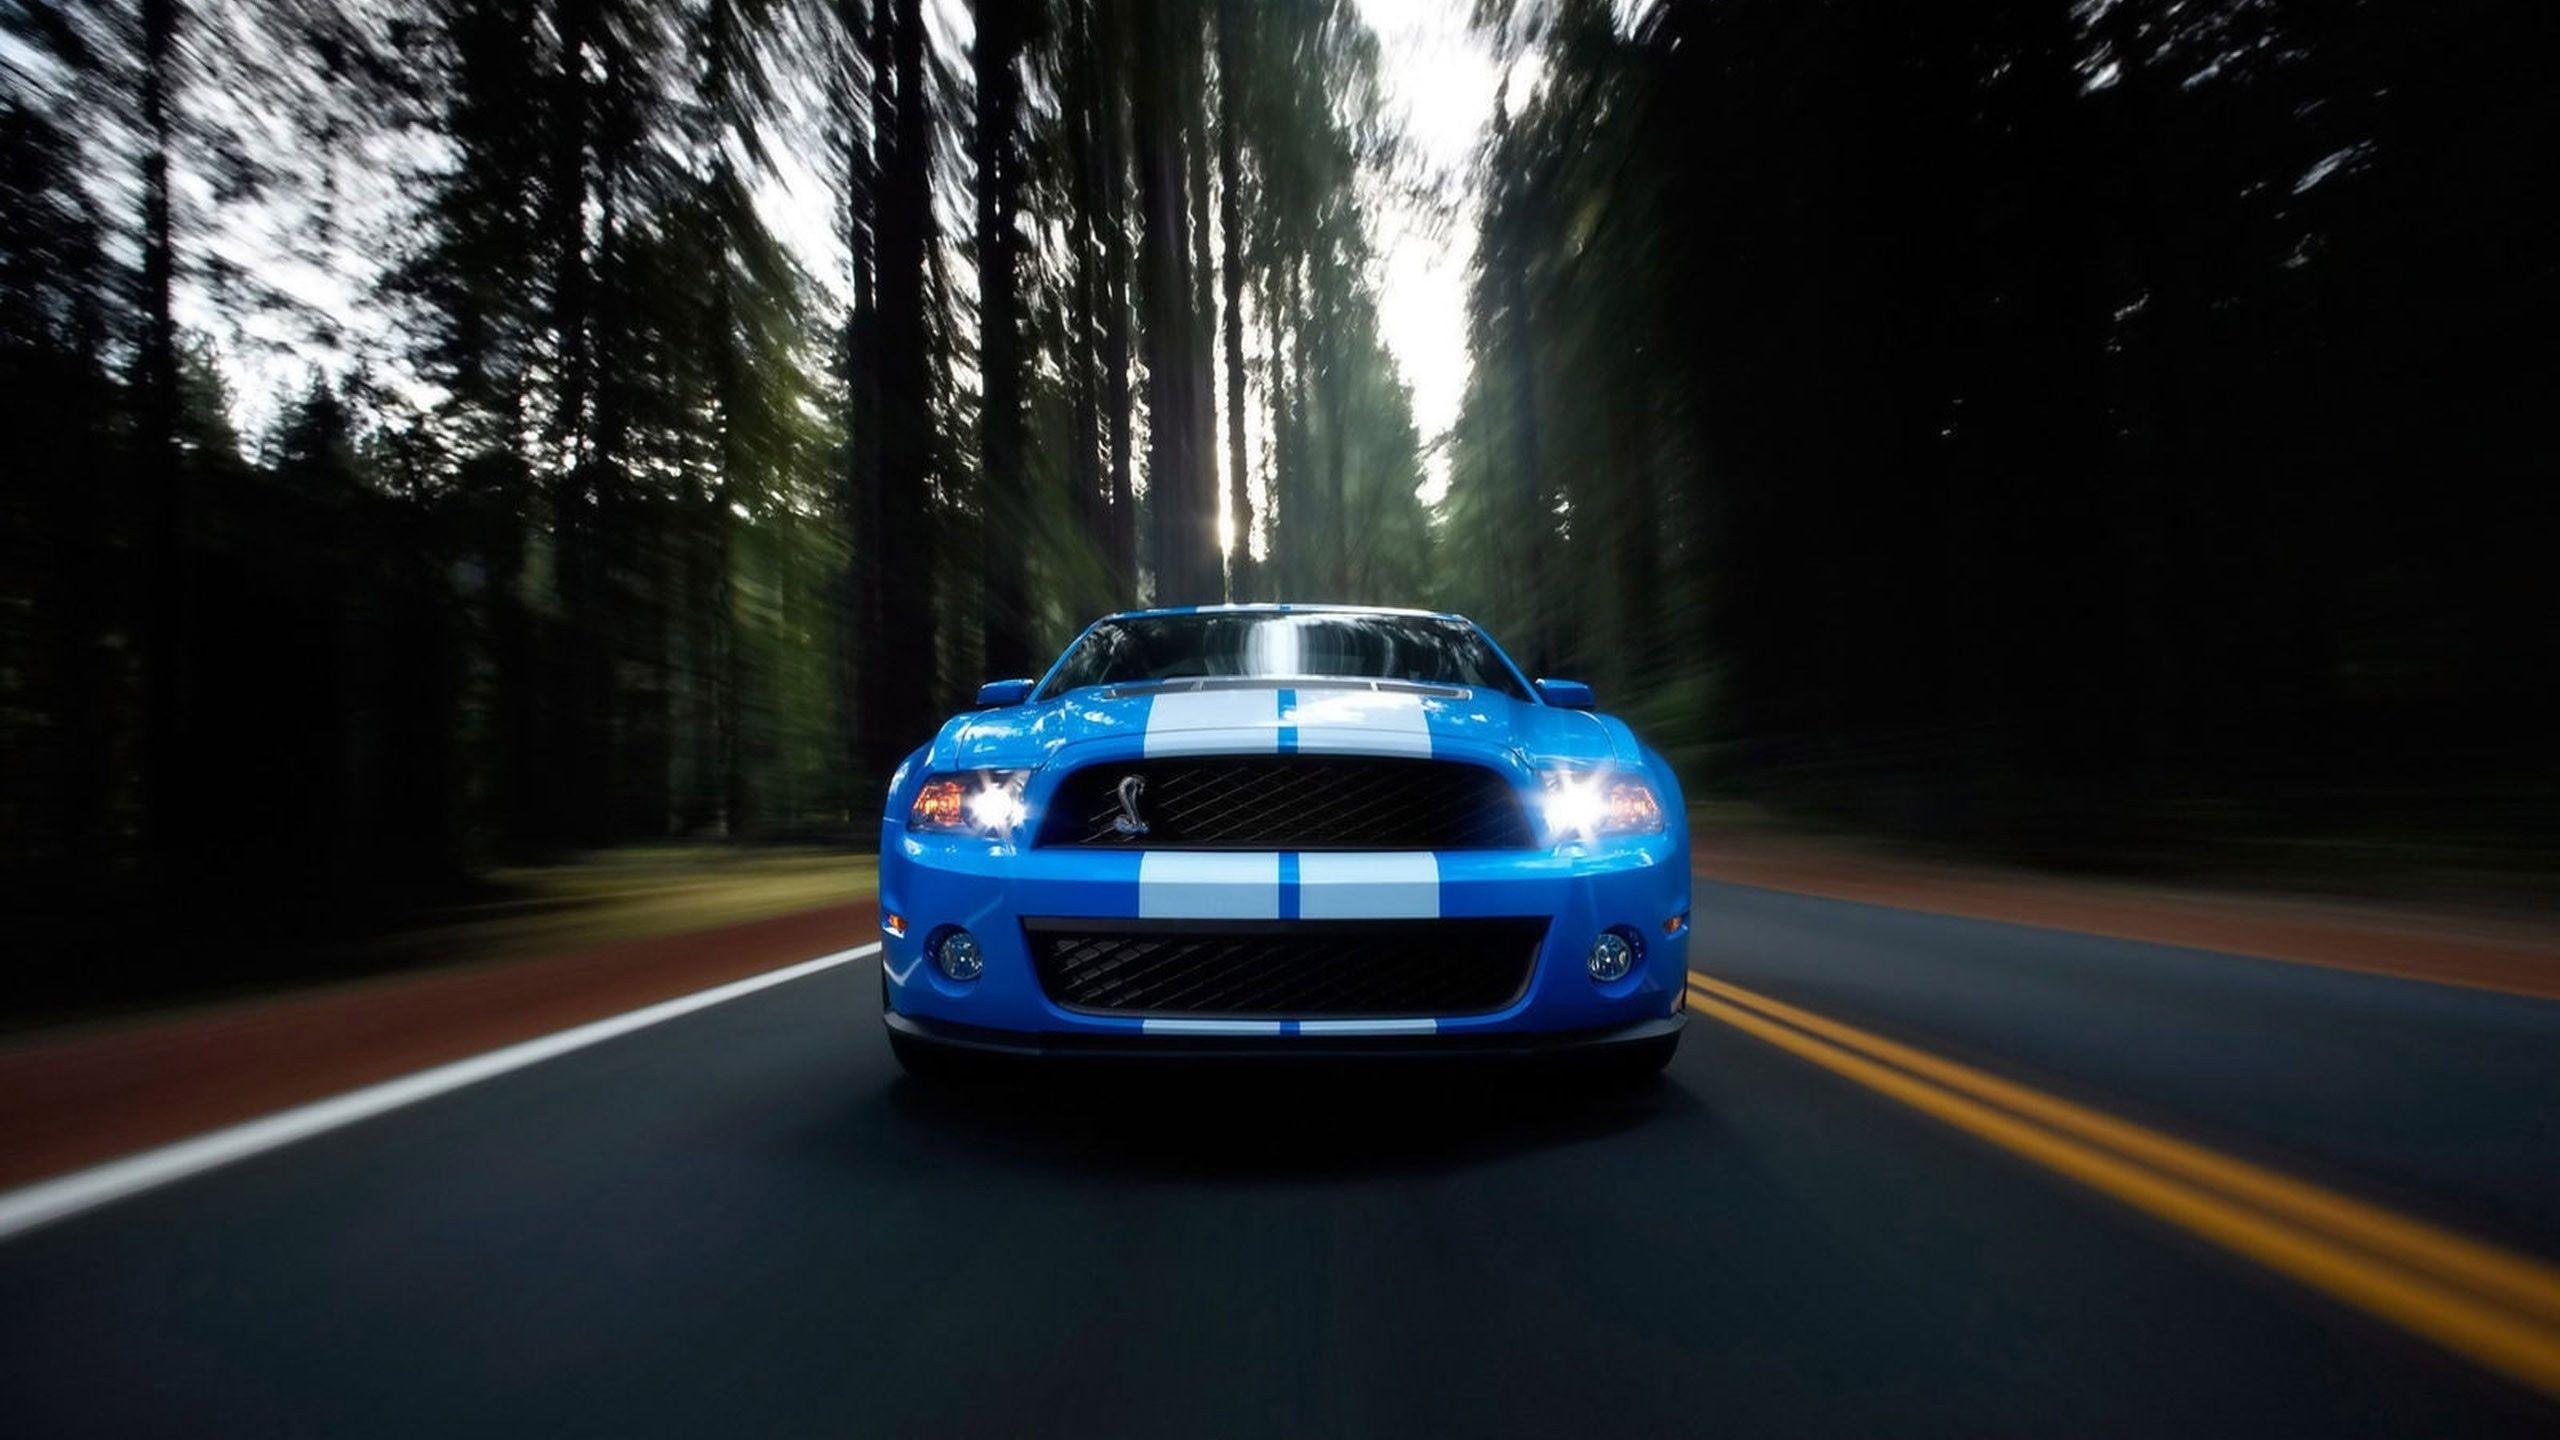 Hd D Mac Car Wallpapers Download 2560 1440 Car Wallpapers For Mac 47 Wallpapers Adorable Wallpapers Ford Mustang Ford Mustang Shelby Ford Mustang Shelby Gt